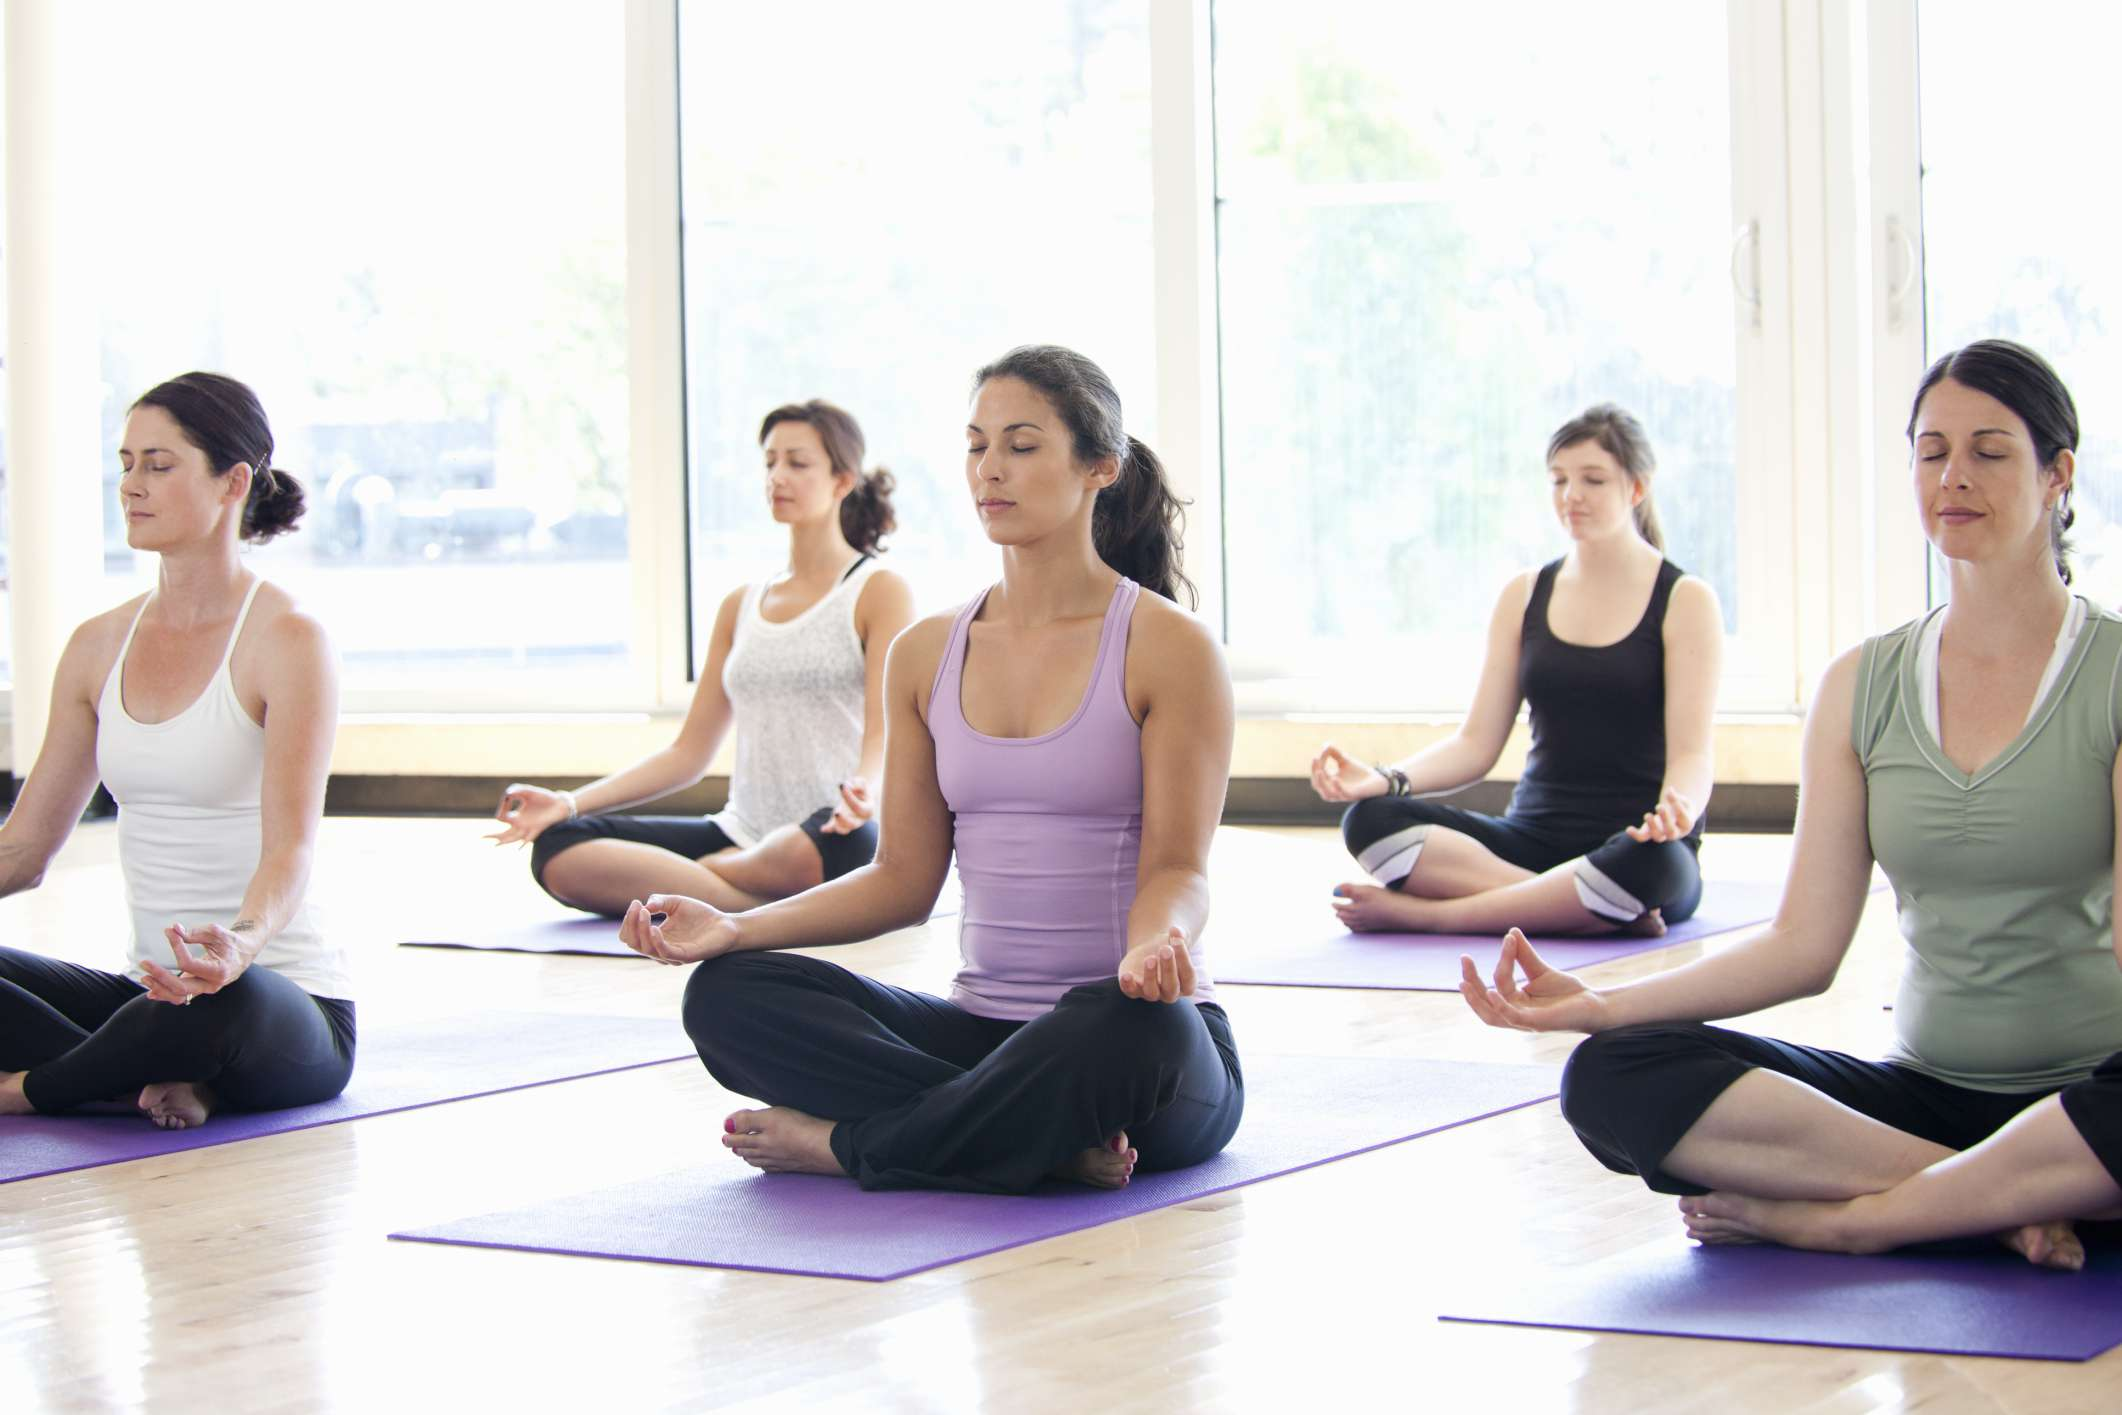 Women practicing yoga in a studio